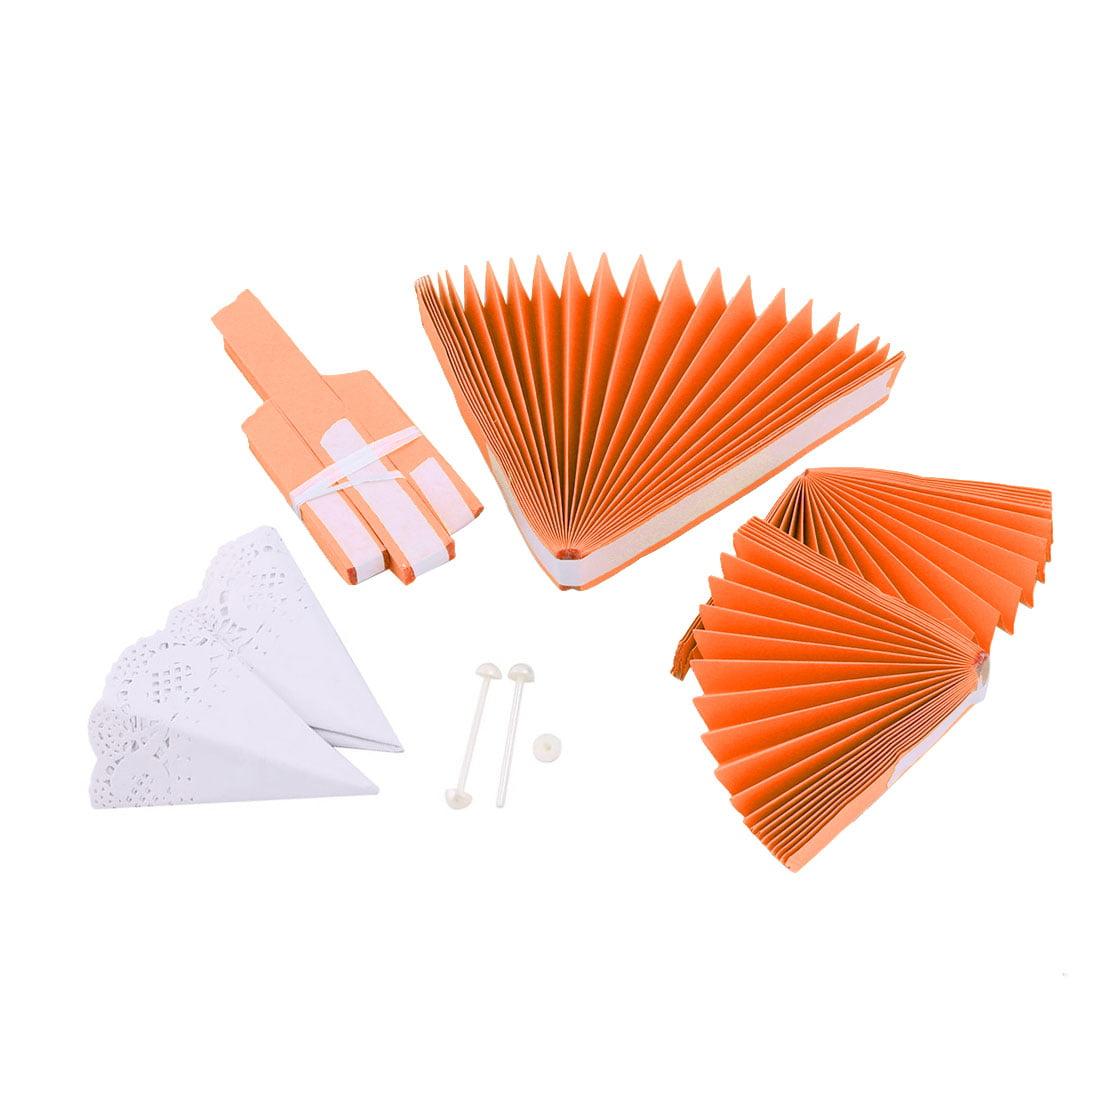 Wedding Party Paper Round 3 Layers Design DIY Handcraft Wheel Fan Orange 2pcs